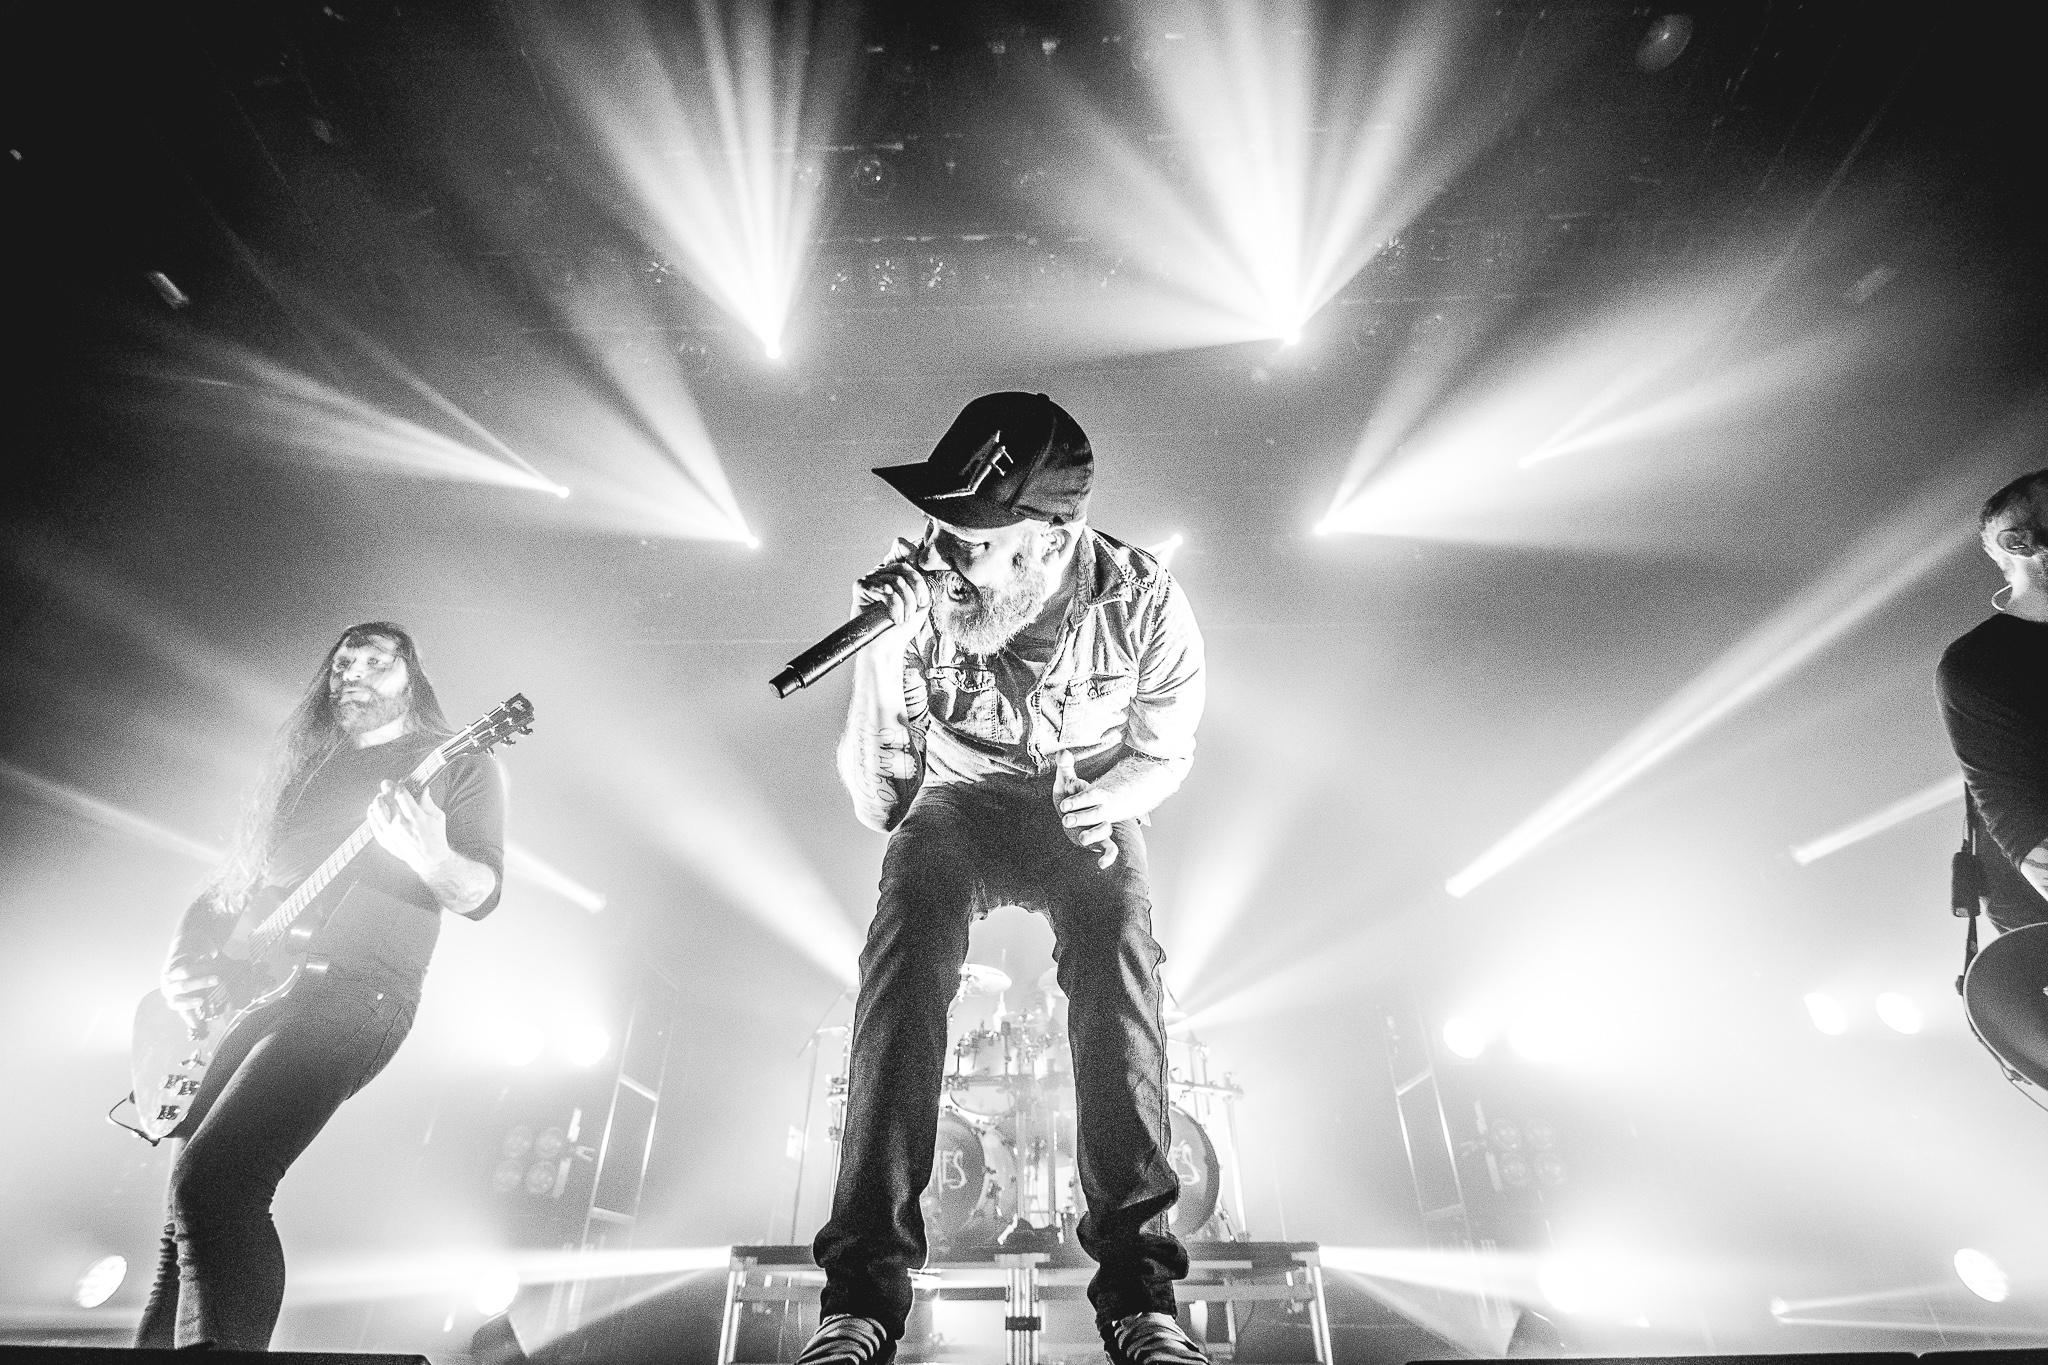 Critique-concert-Opeth-and-In-Flames-Metropolis-de-Montreal-samedi-20-decembre-2014_02